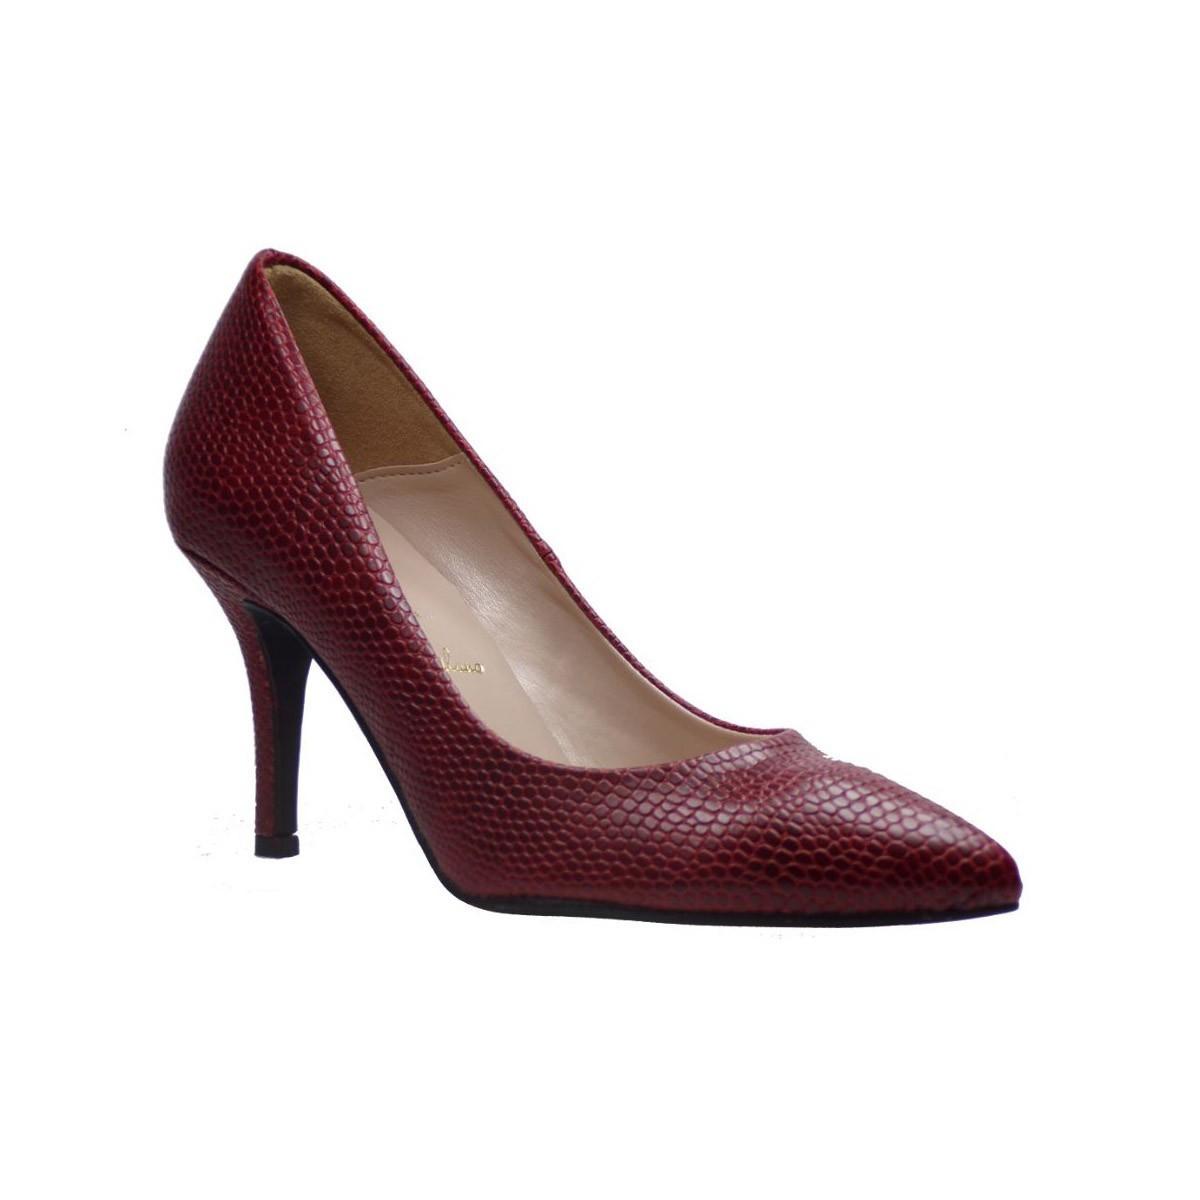 Alessandra Paggioti Γυναικεία Παπούτσια Γόβες 83001 Μπορντώ Cobra